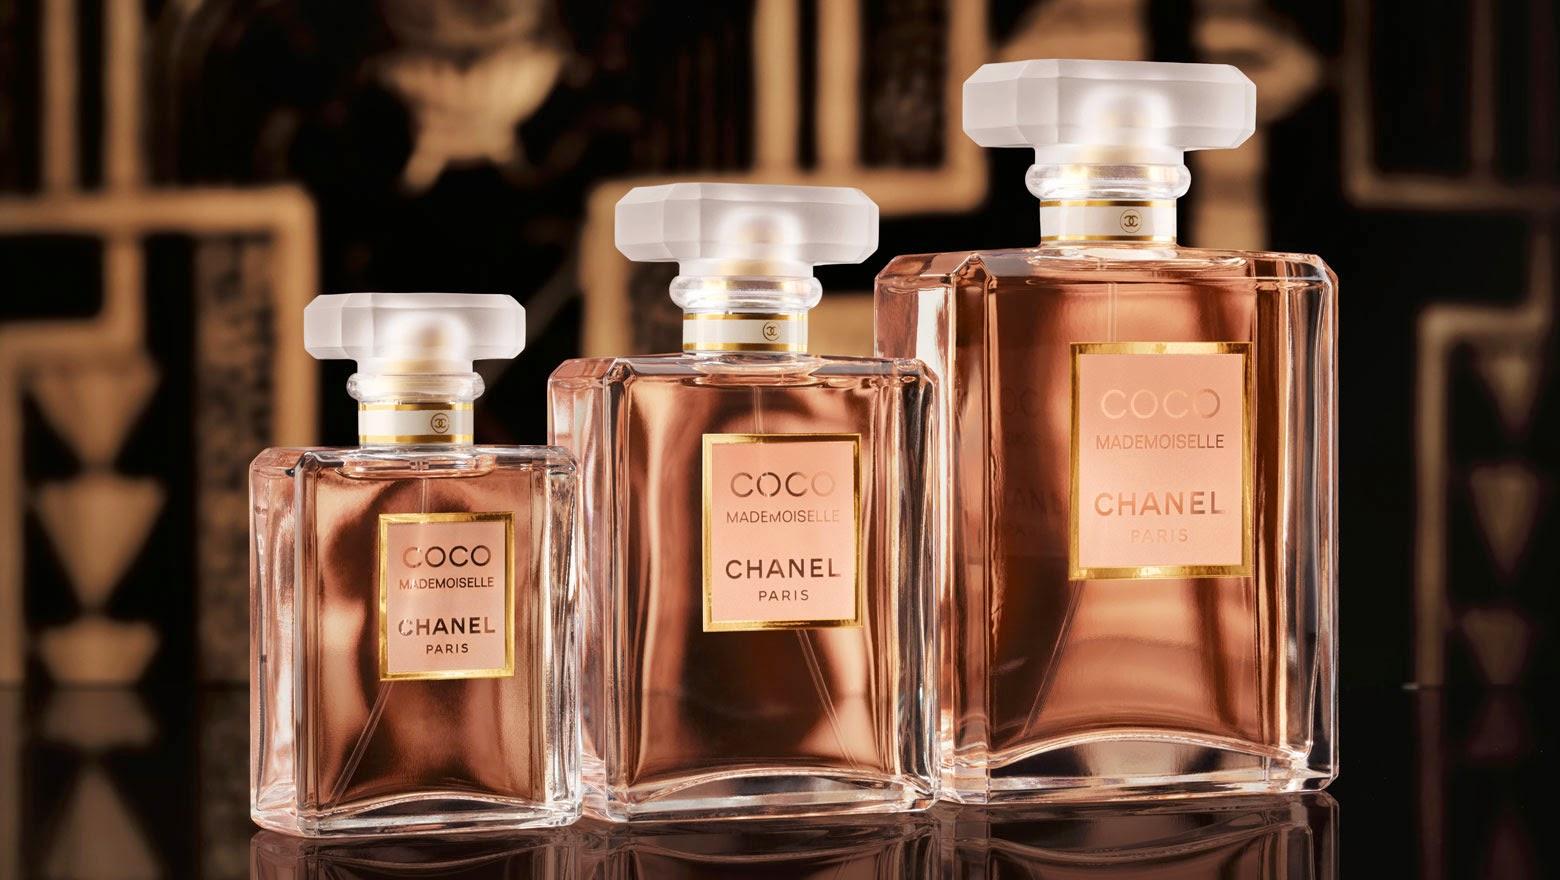 https://glio.com/p/perfume-chanel-coco-mademoiselle-feminino-100ml/?a=carsnlprfm